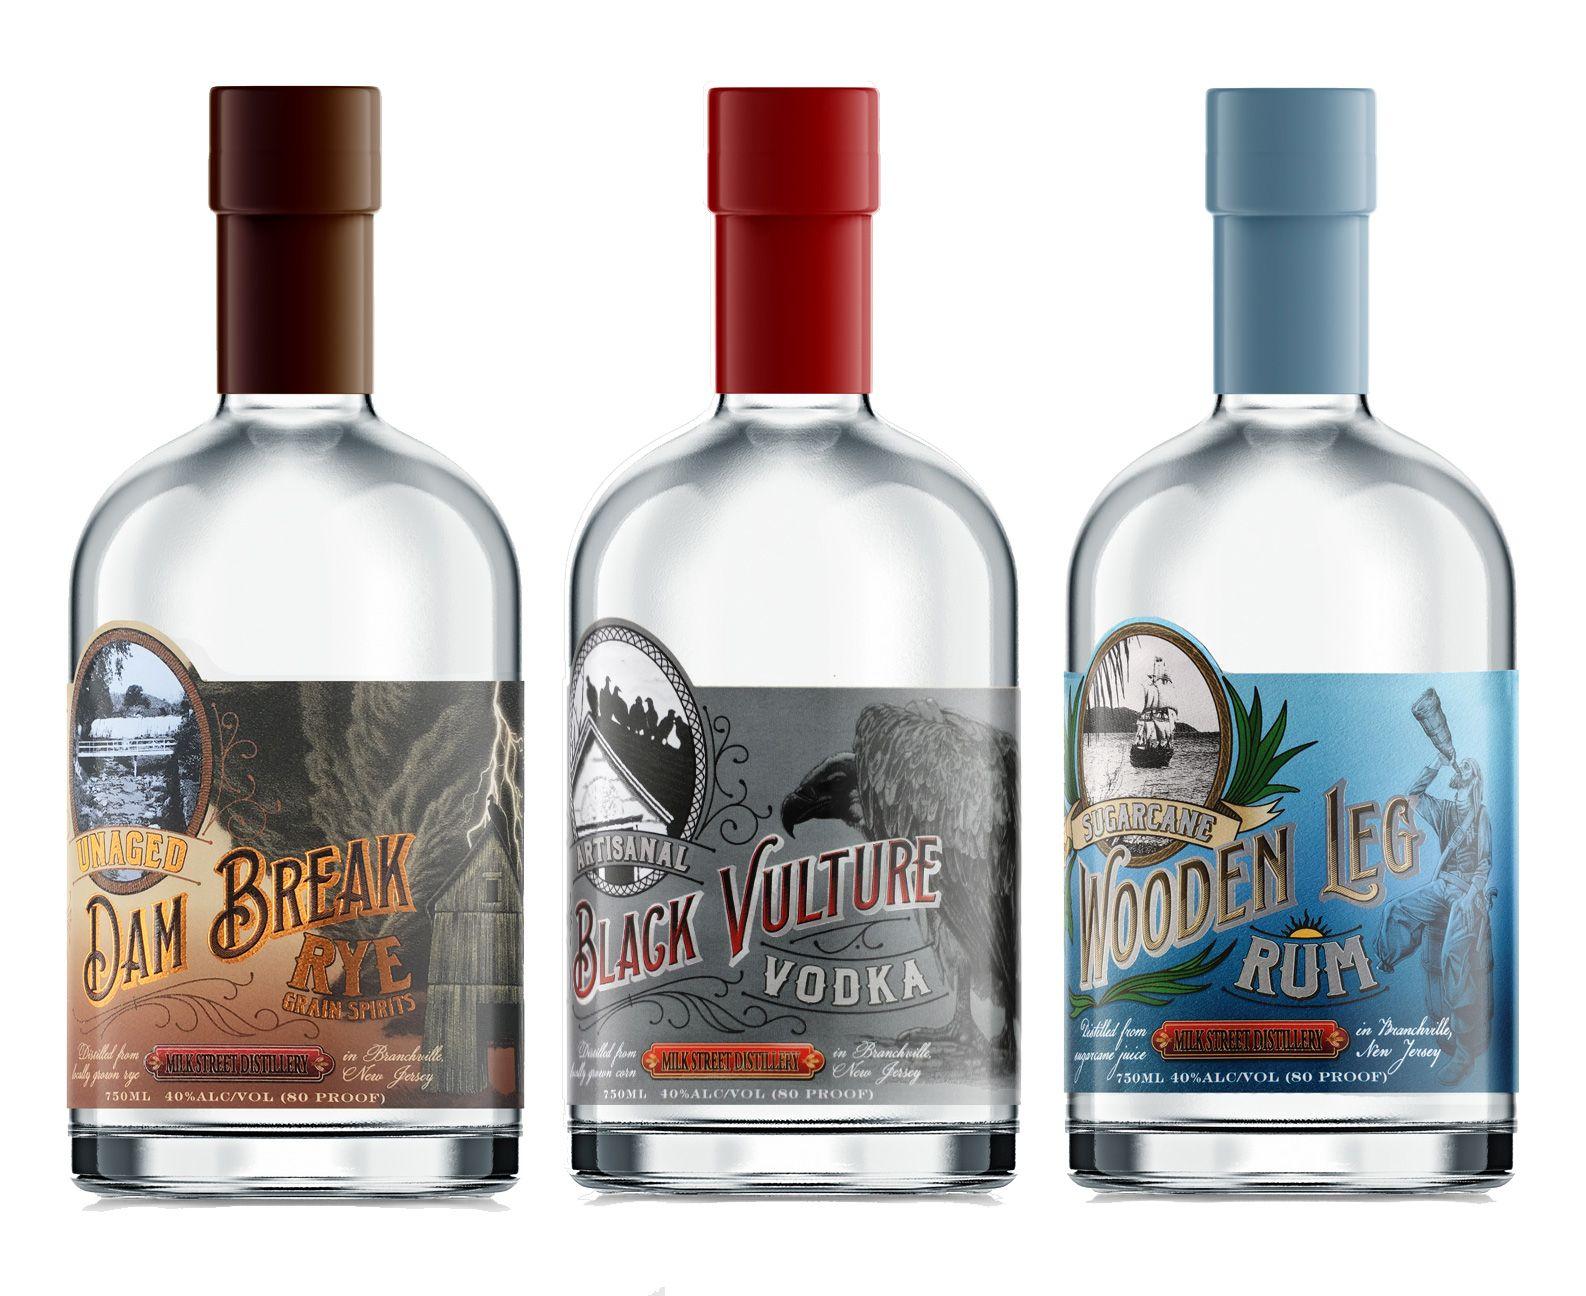 Labels For Craft Spirits Rye Vodka And White Rum From Milk Street Distillery In Branchville Nj Pomegranate Design Creative Packaging Design Craft Spirits